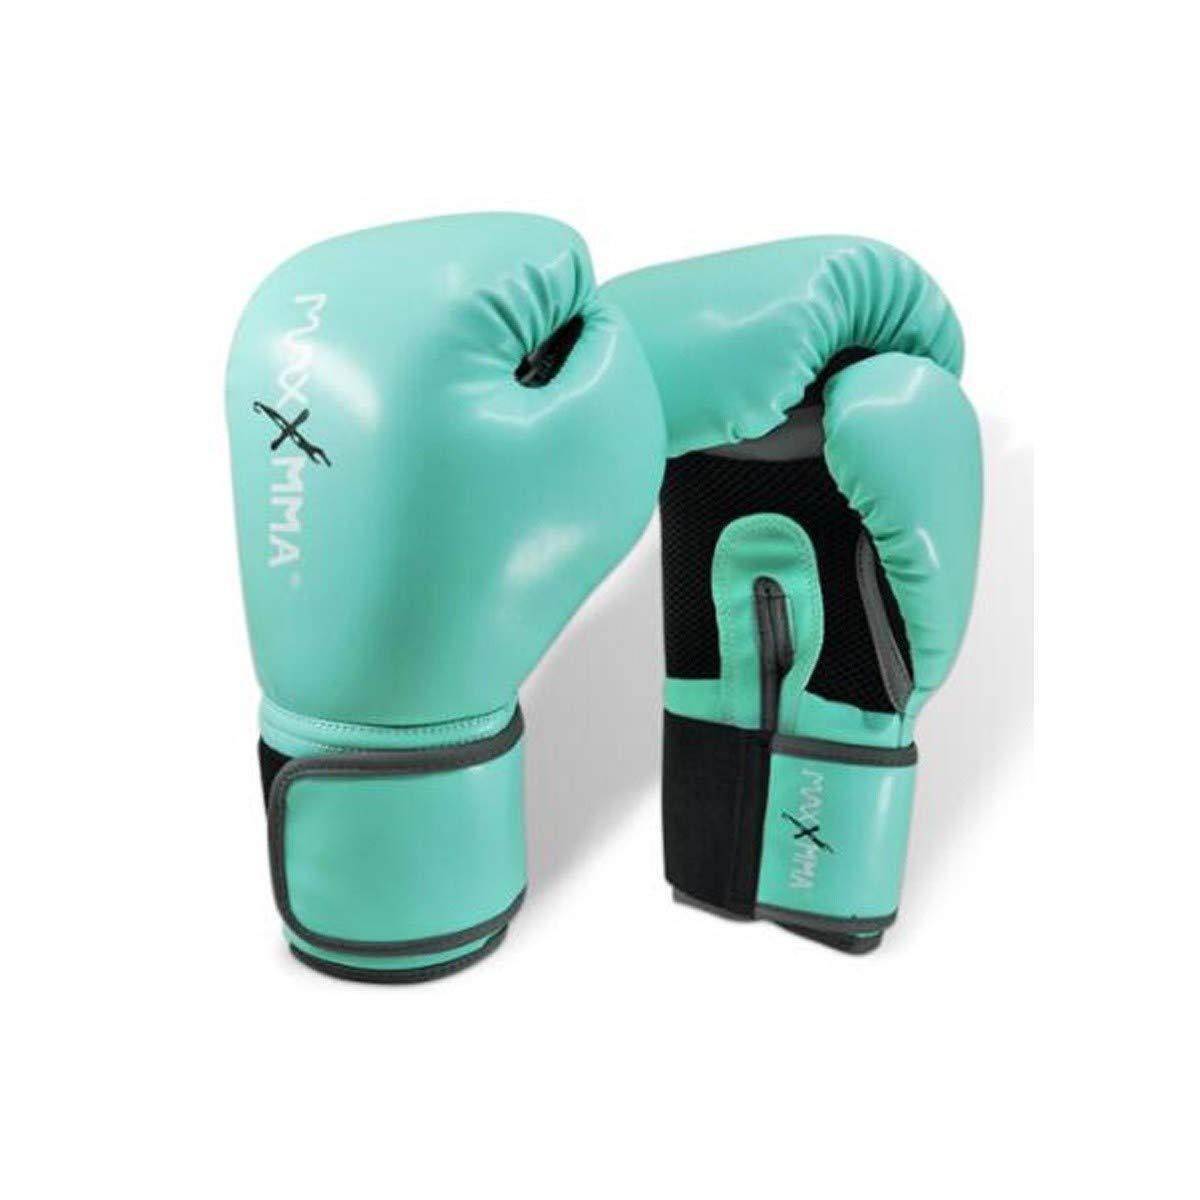 LHSY ボクシンググローブ、プロフェッショナルボクシンググローブUFCトレーニングムエタイボクシング、三田パンチングバッググローブ、大人の男性と女性のミントグリーングローブファイト (Size : 6oz)  6oz